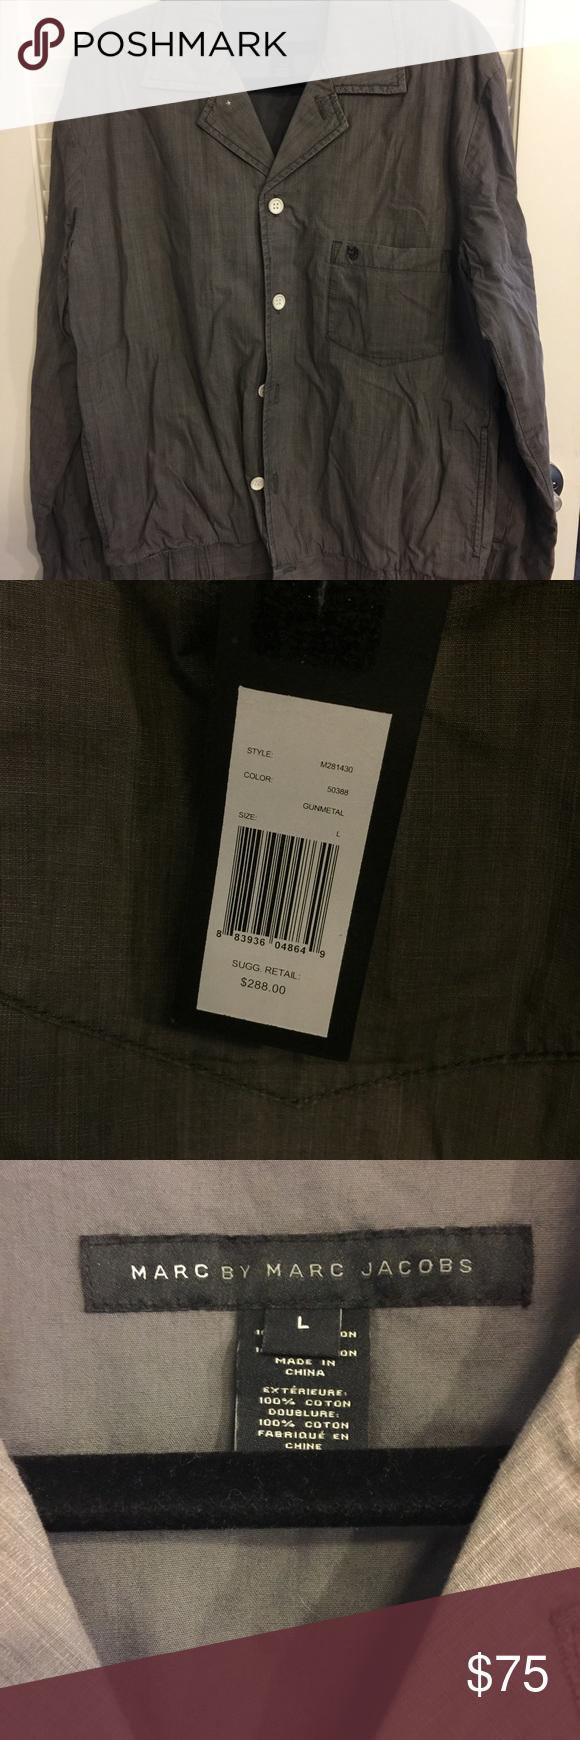 Marc Jacobs Jacket Marc by Marc Jacobs Jacket - NWT Marc by Marc Jacobs Jackets & Coats Lightweight & Shirt Jackets